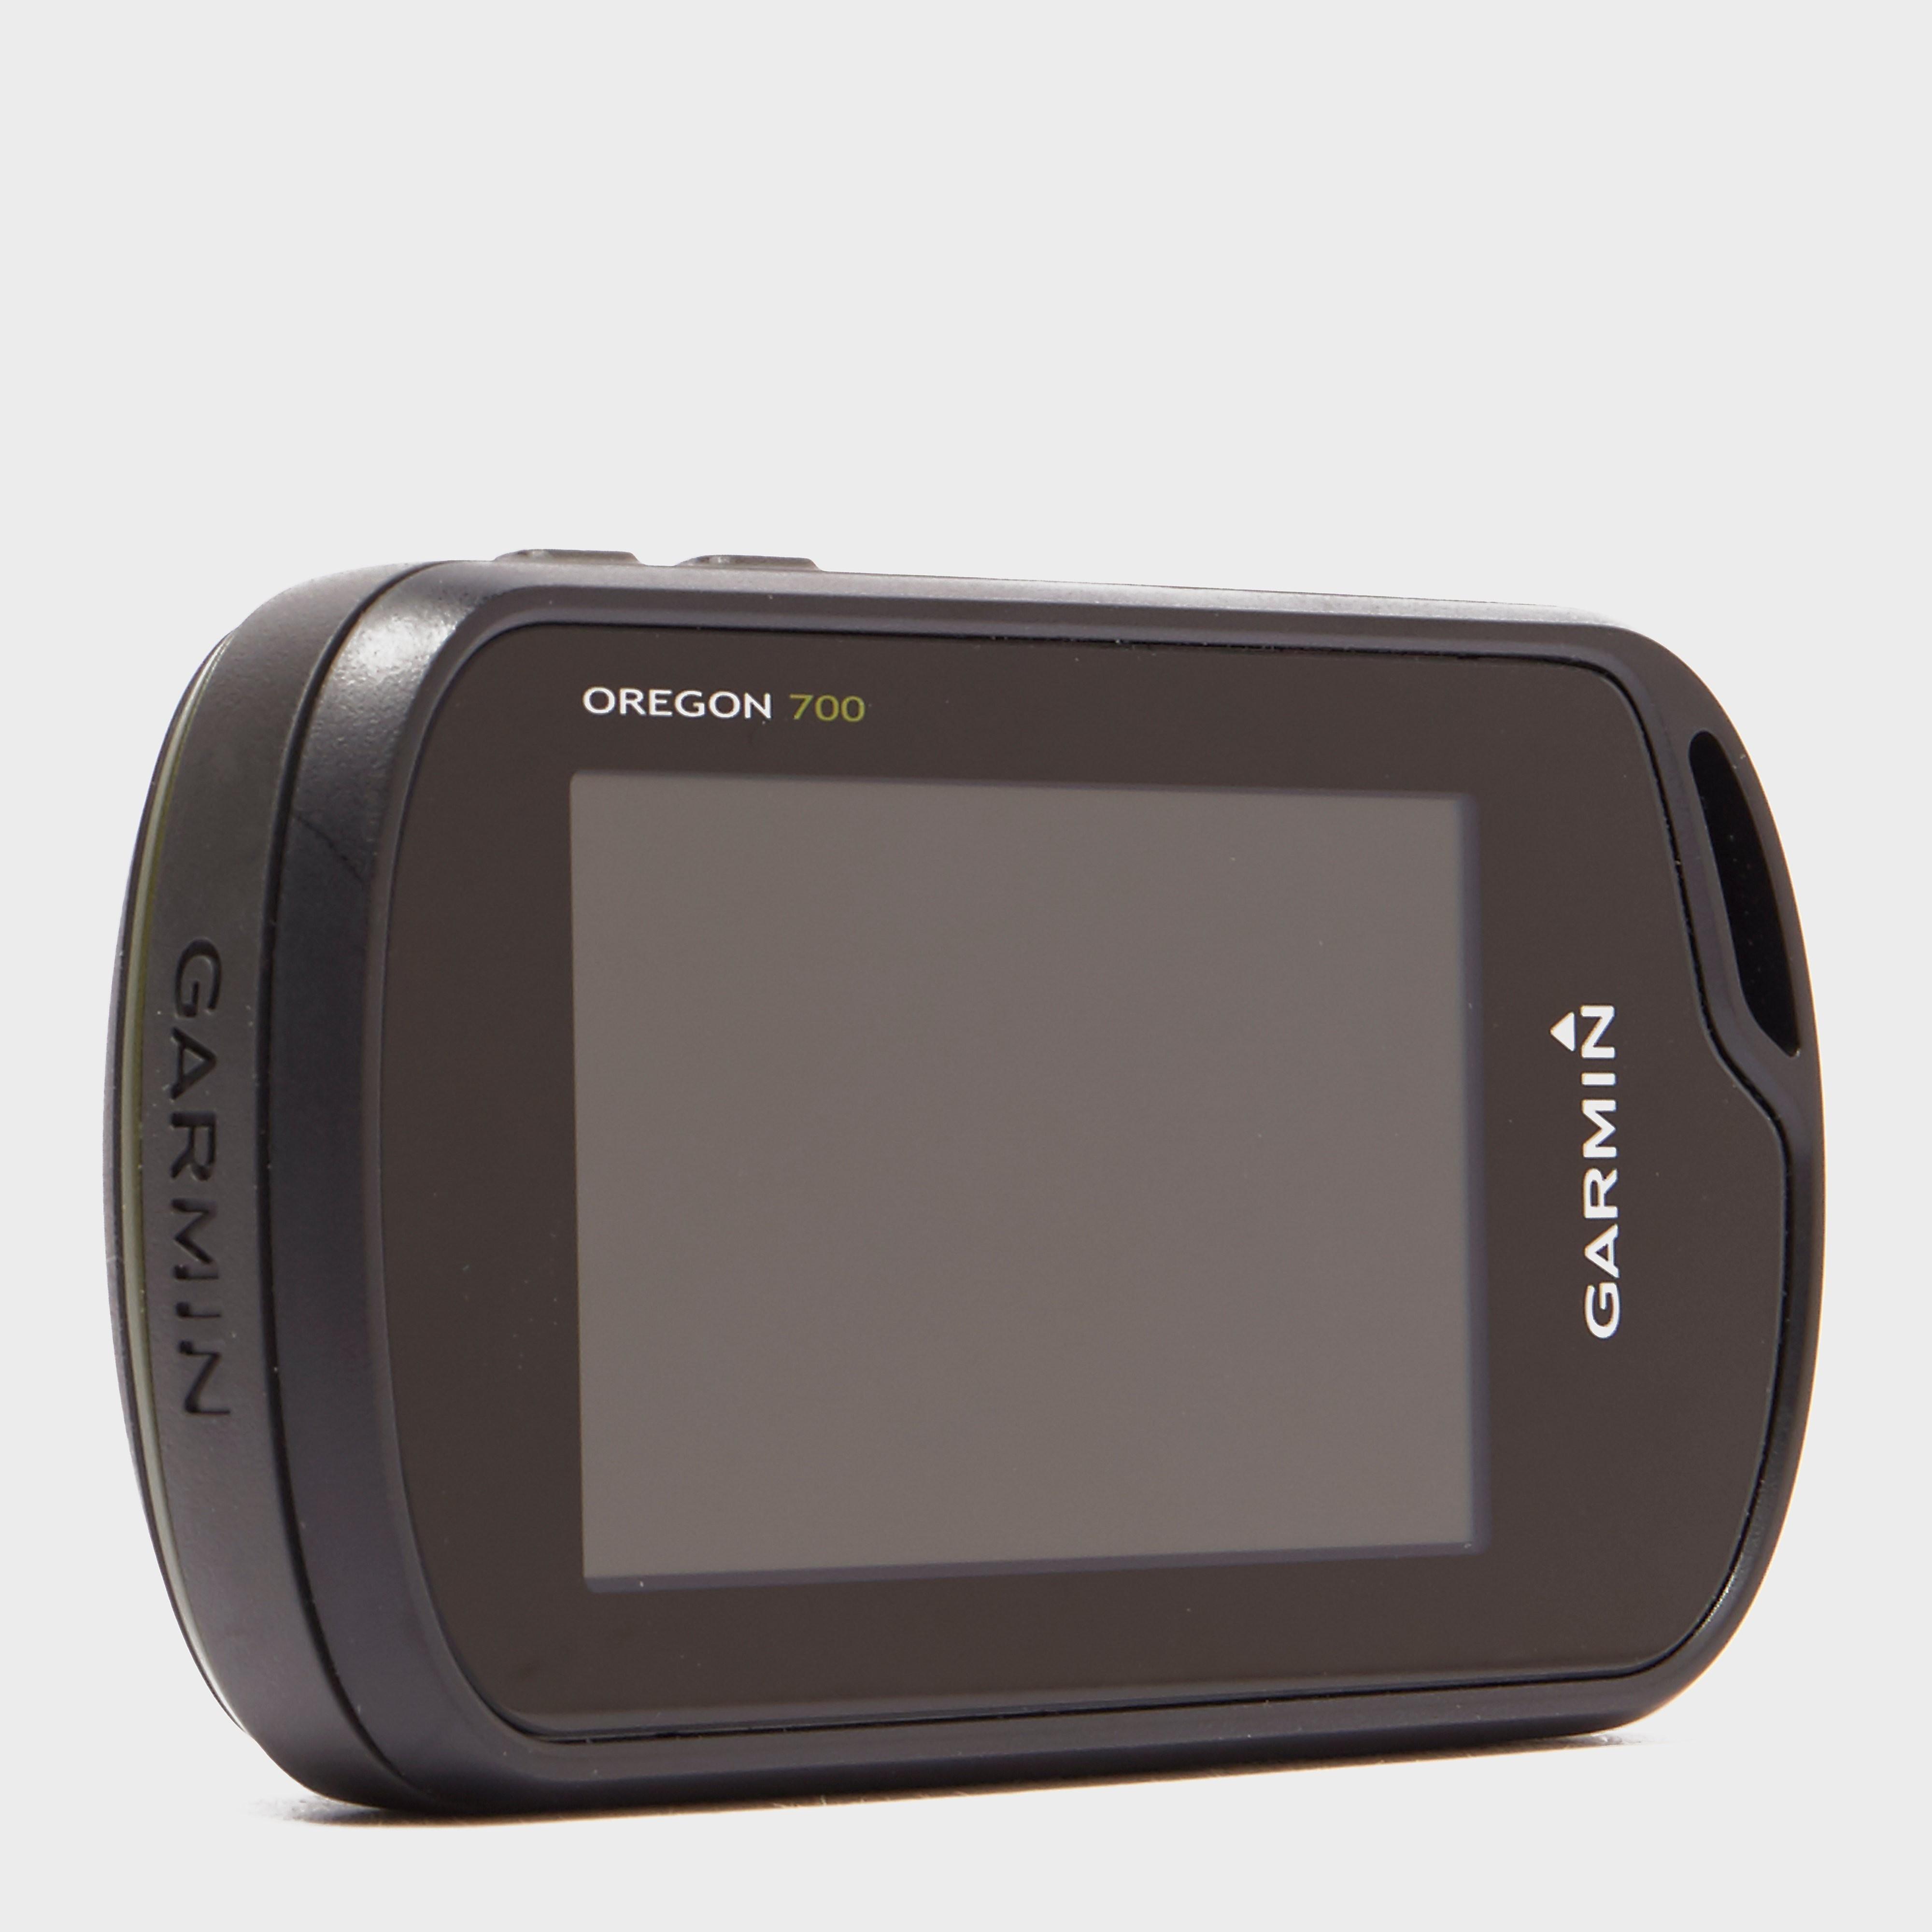 Garmin Oregon® 700 Handheld GPS